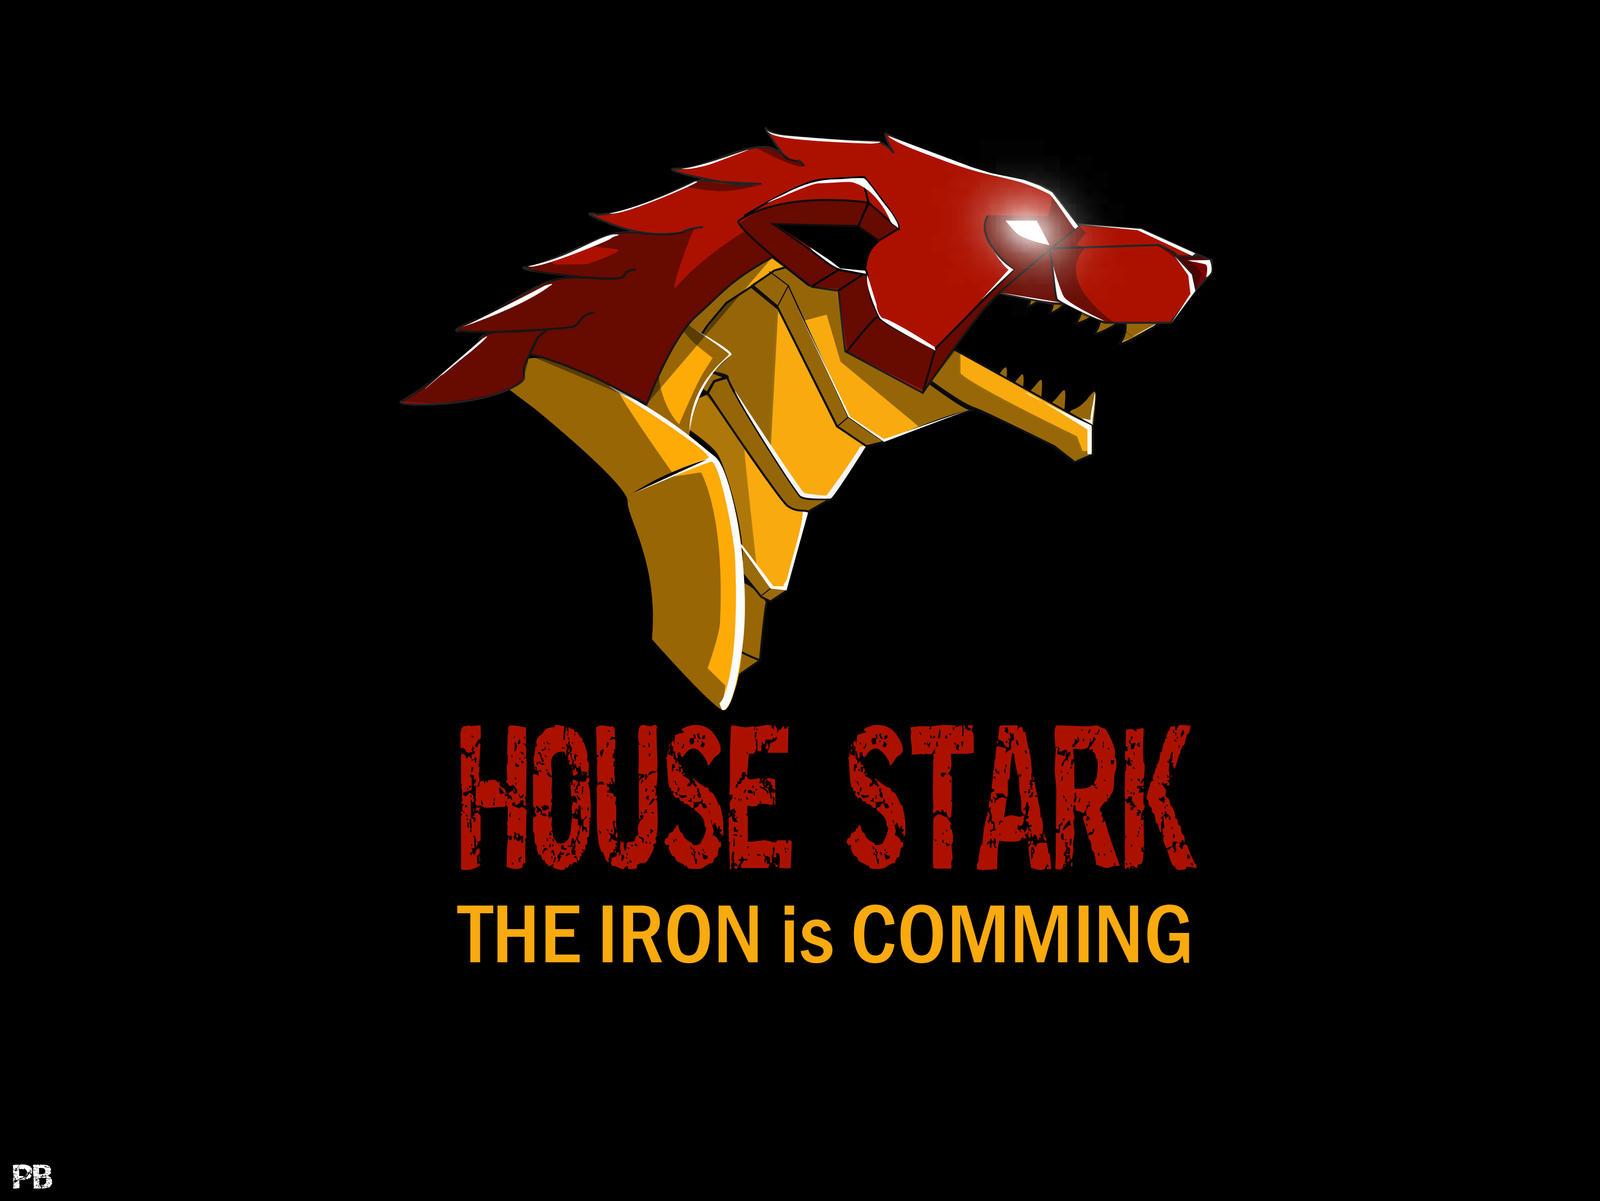 House Stark By Cvira On Deviantart